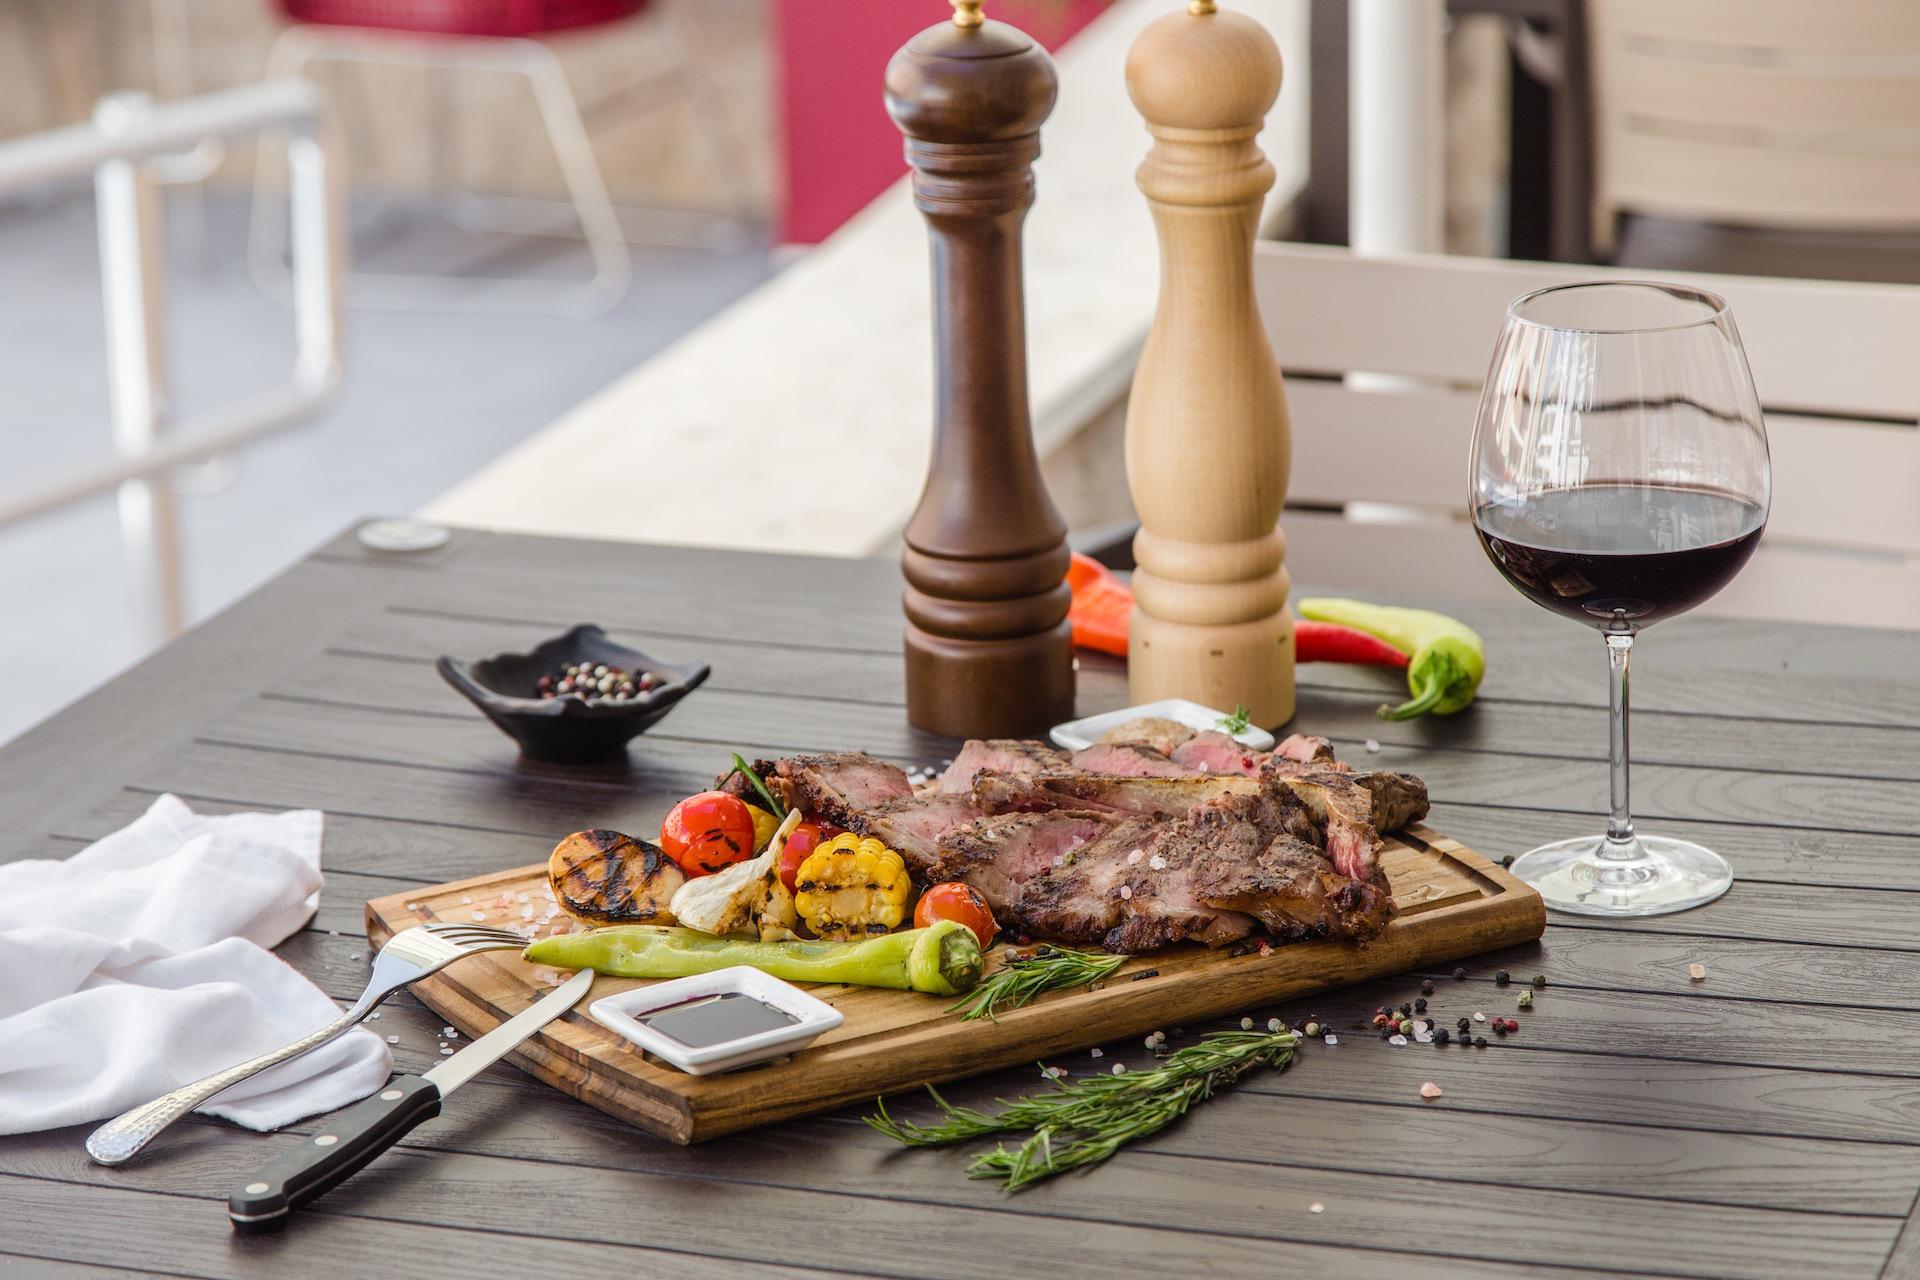 Restaurant Anatolia lounge cafe becici montenegro budva poll 4.jpeg